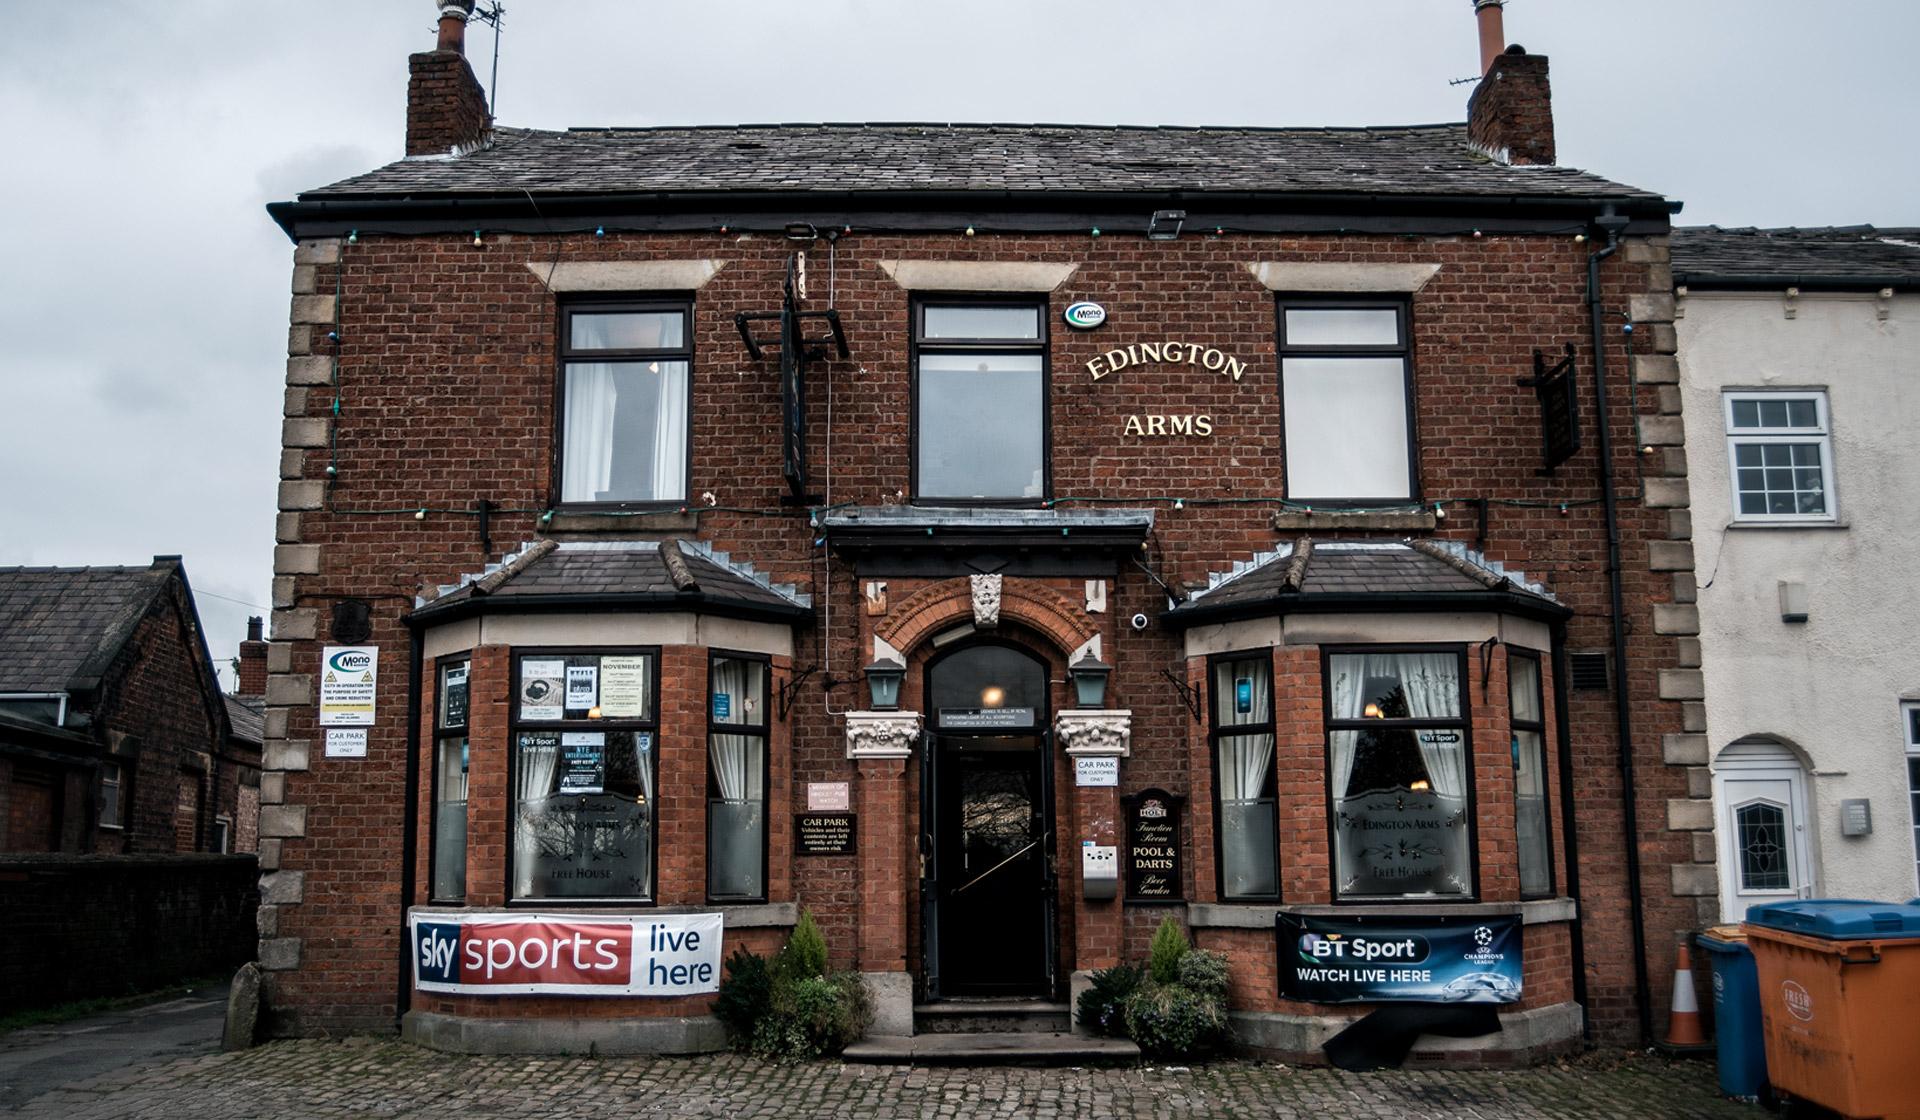 edington arms pub